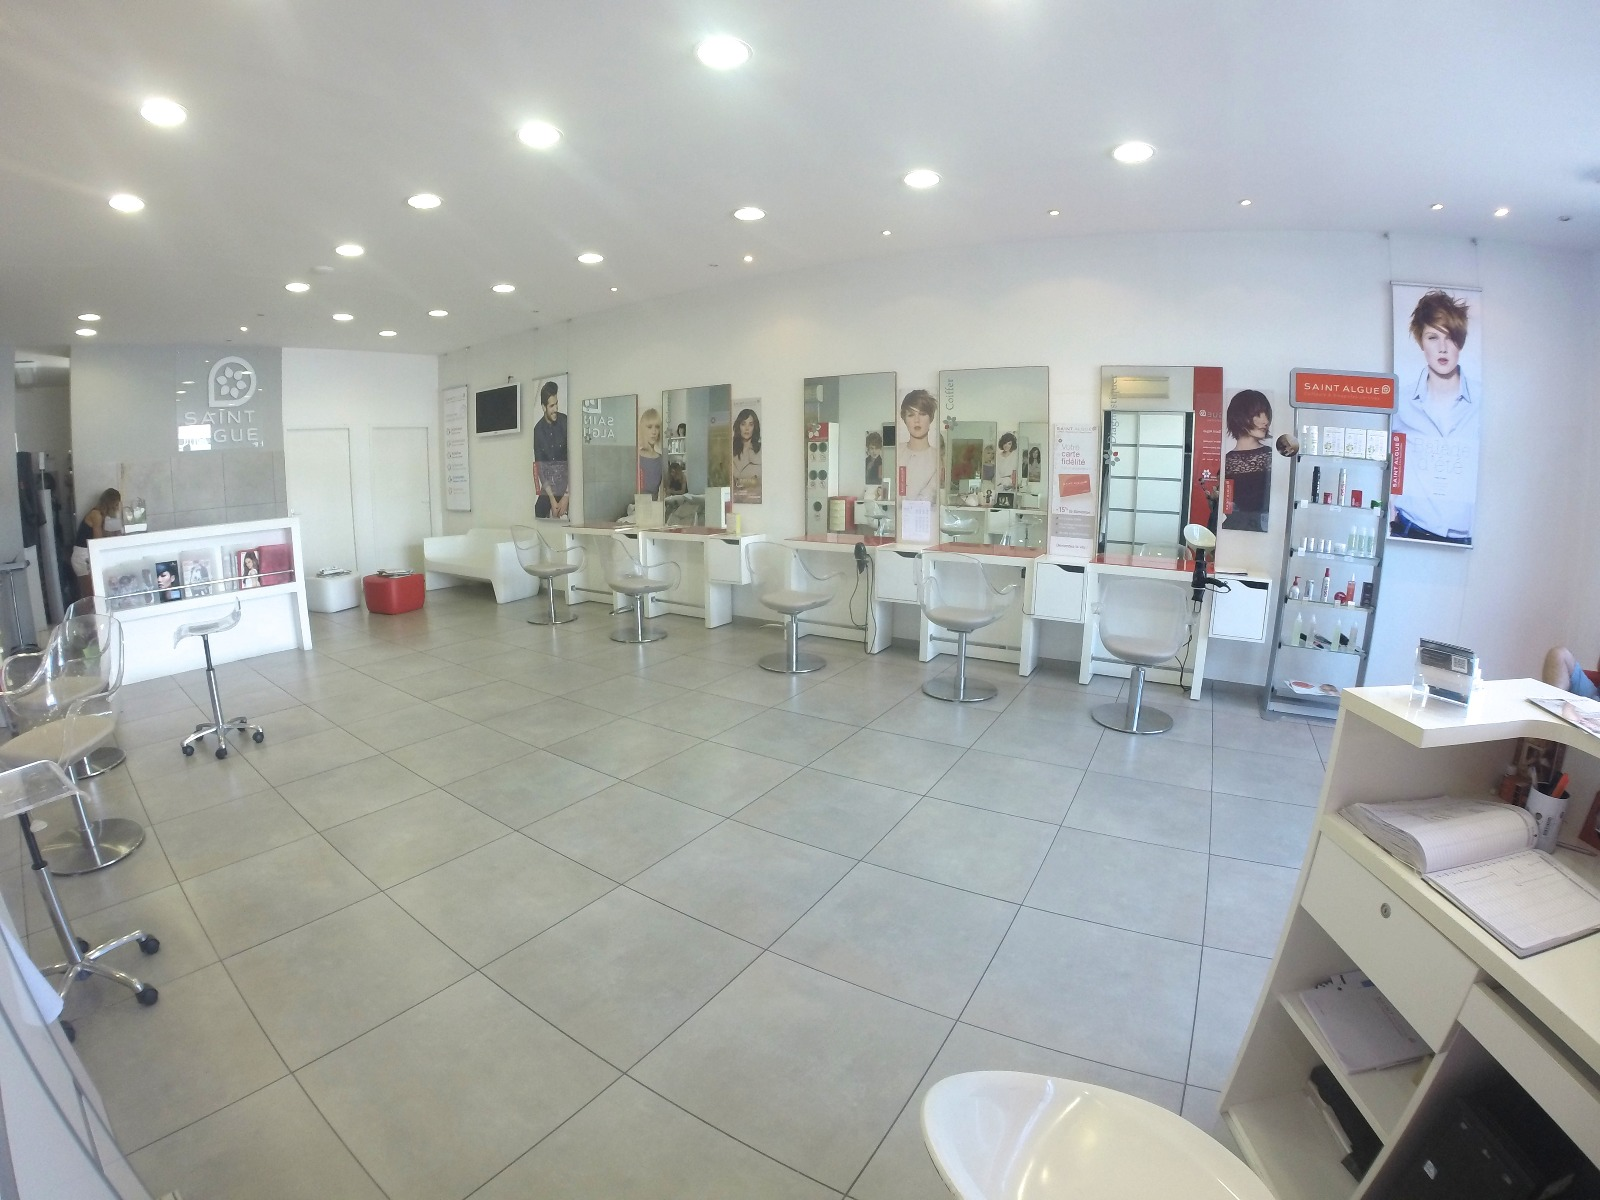 Vente salon de coiffure mezzavia lpt immobilier for Vente salon de coiffure